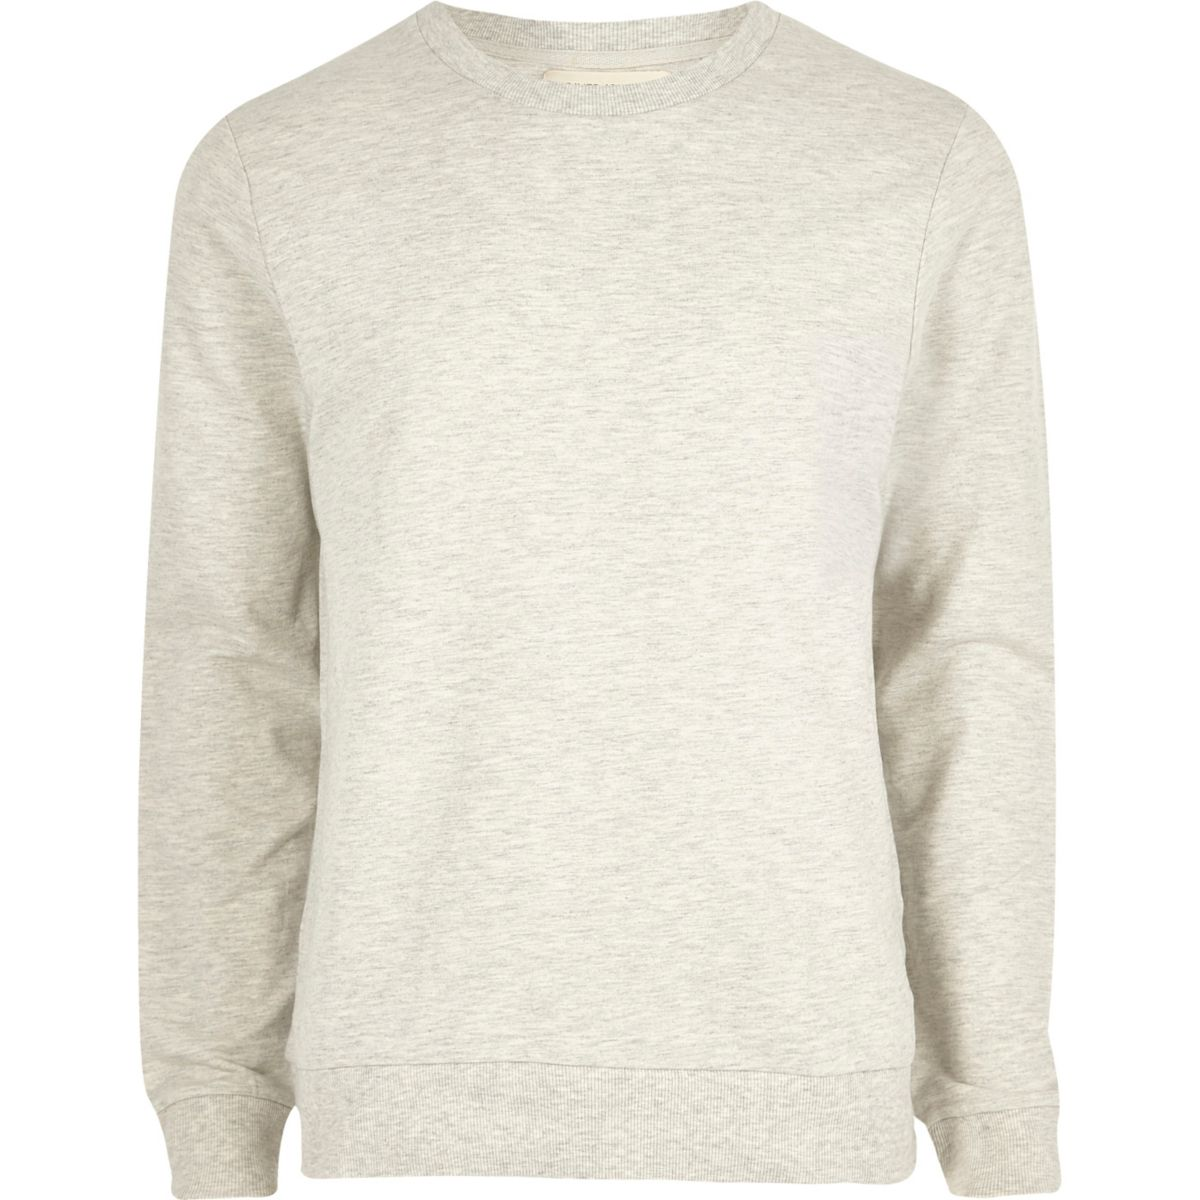 Light grey marl crew neck sweatshirt